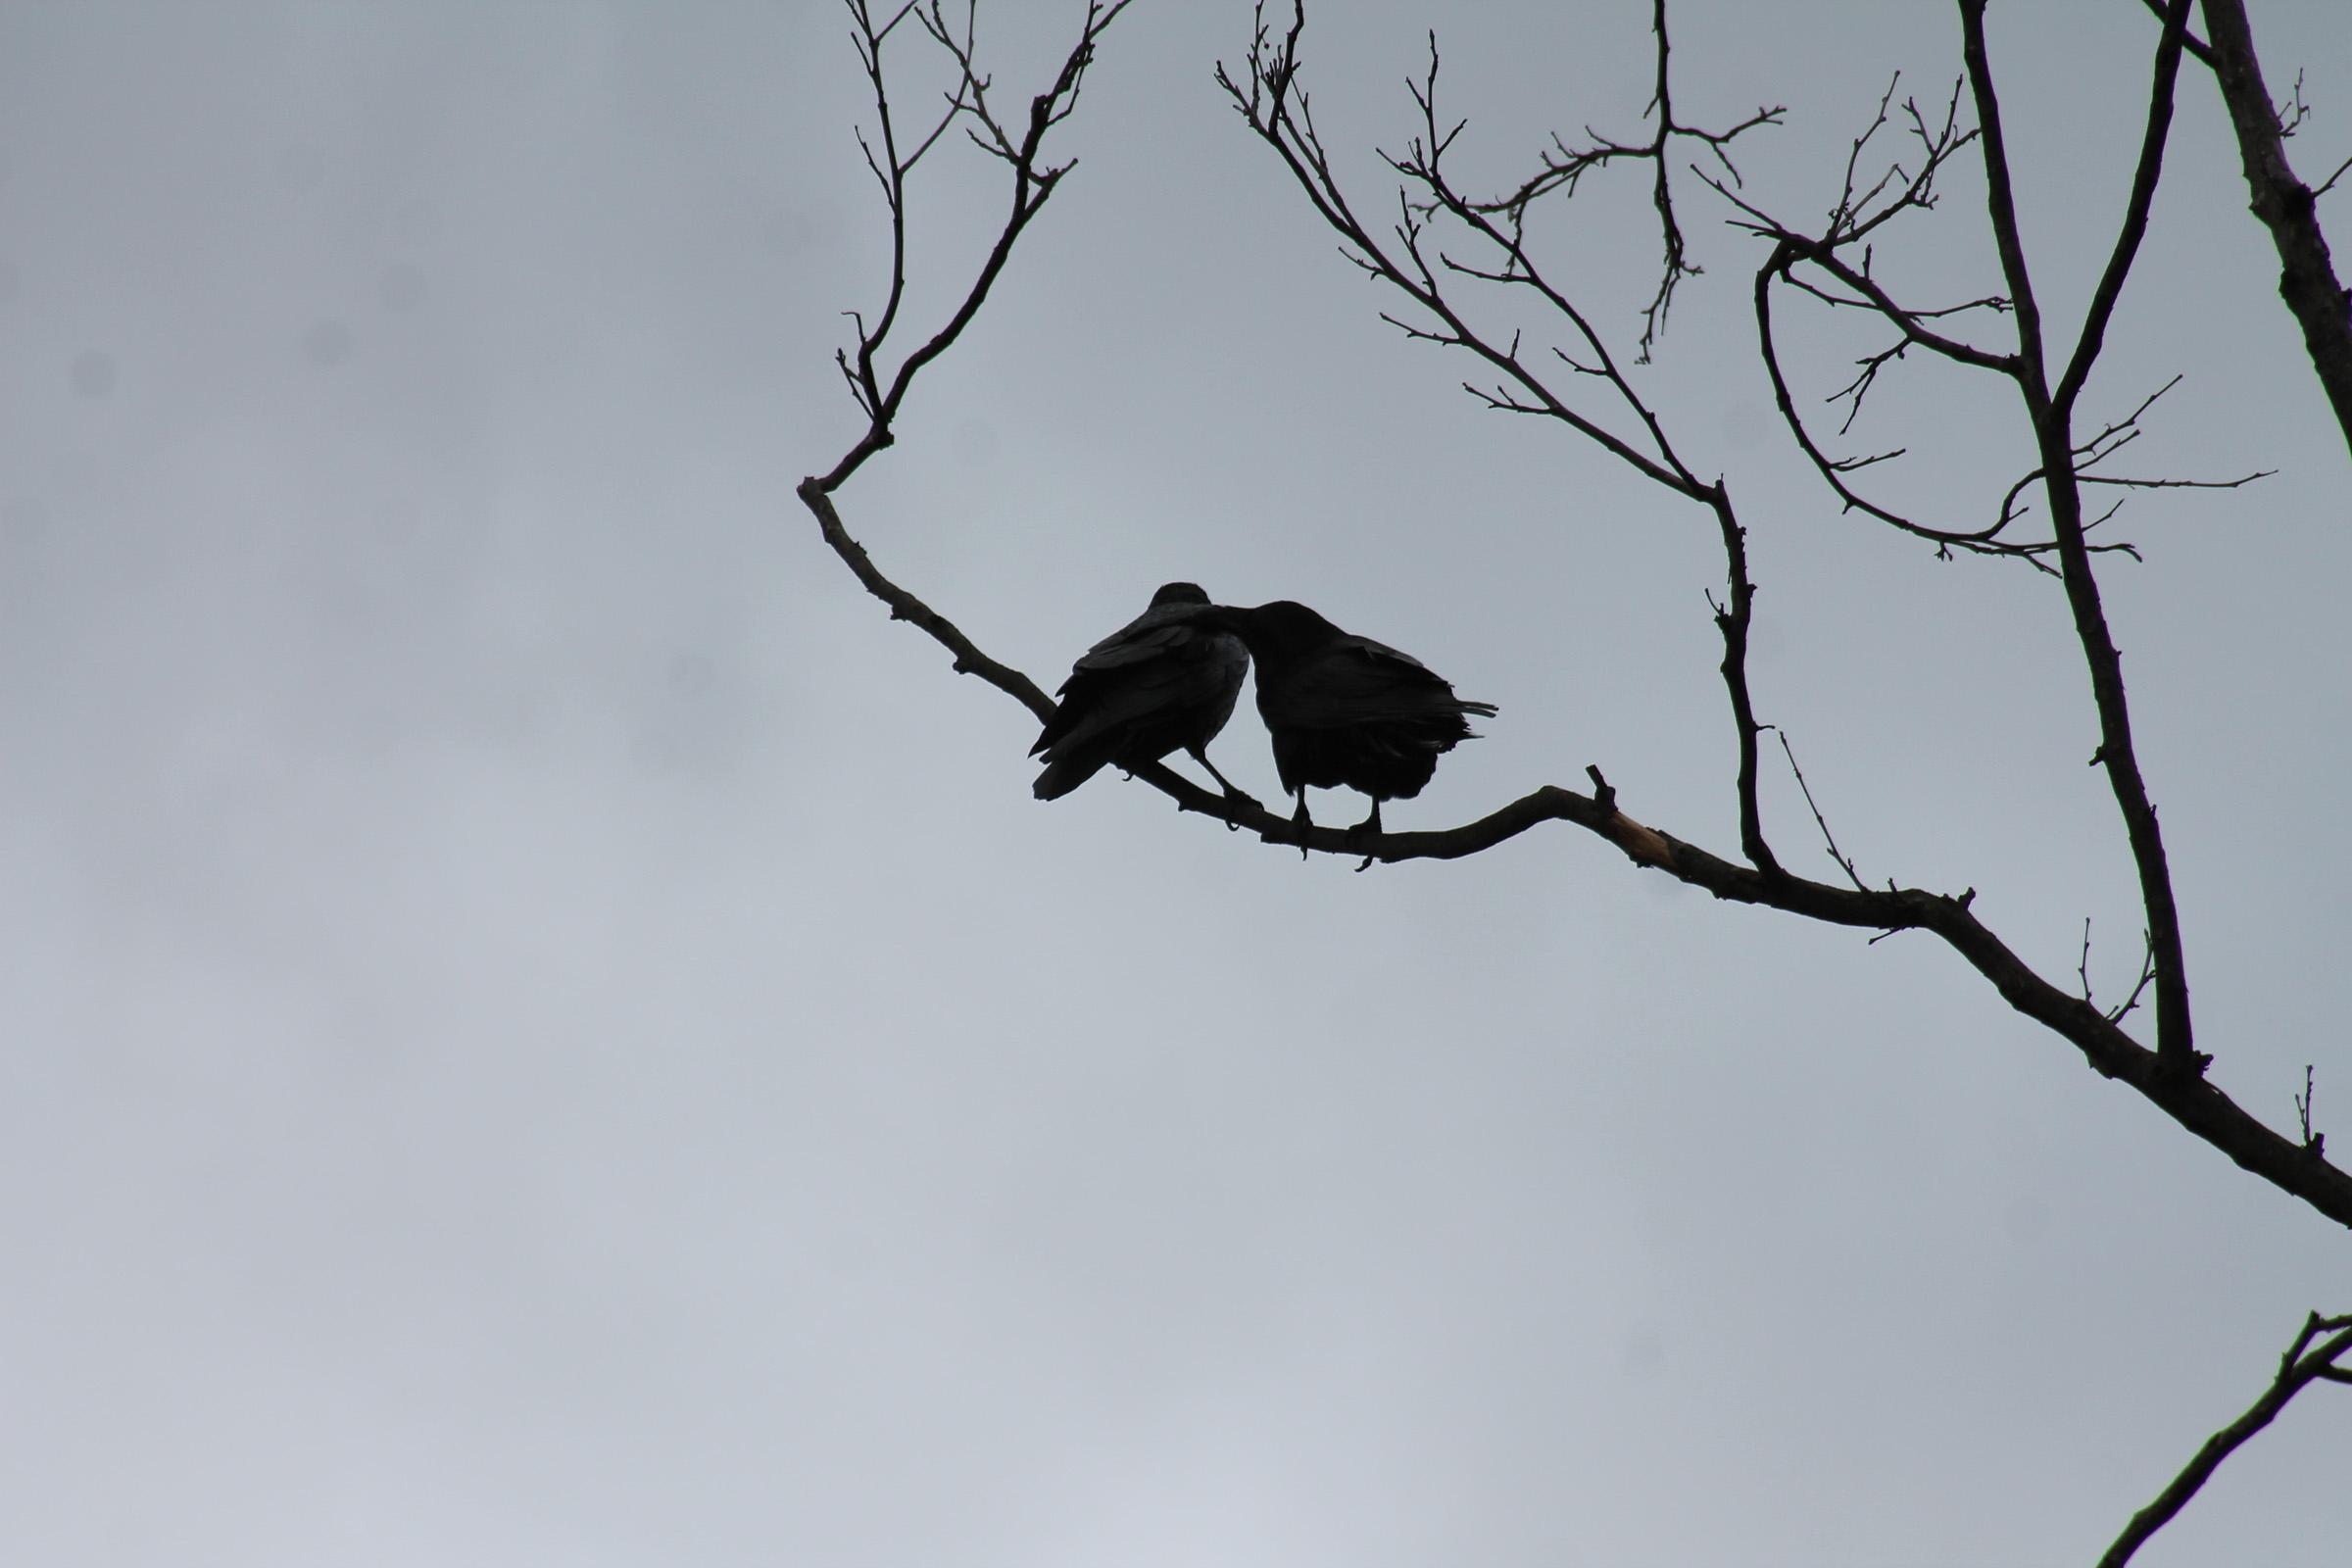 ravens preening.jpg